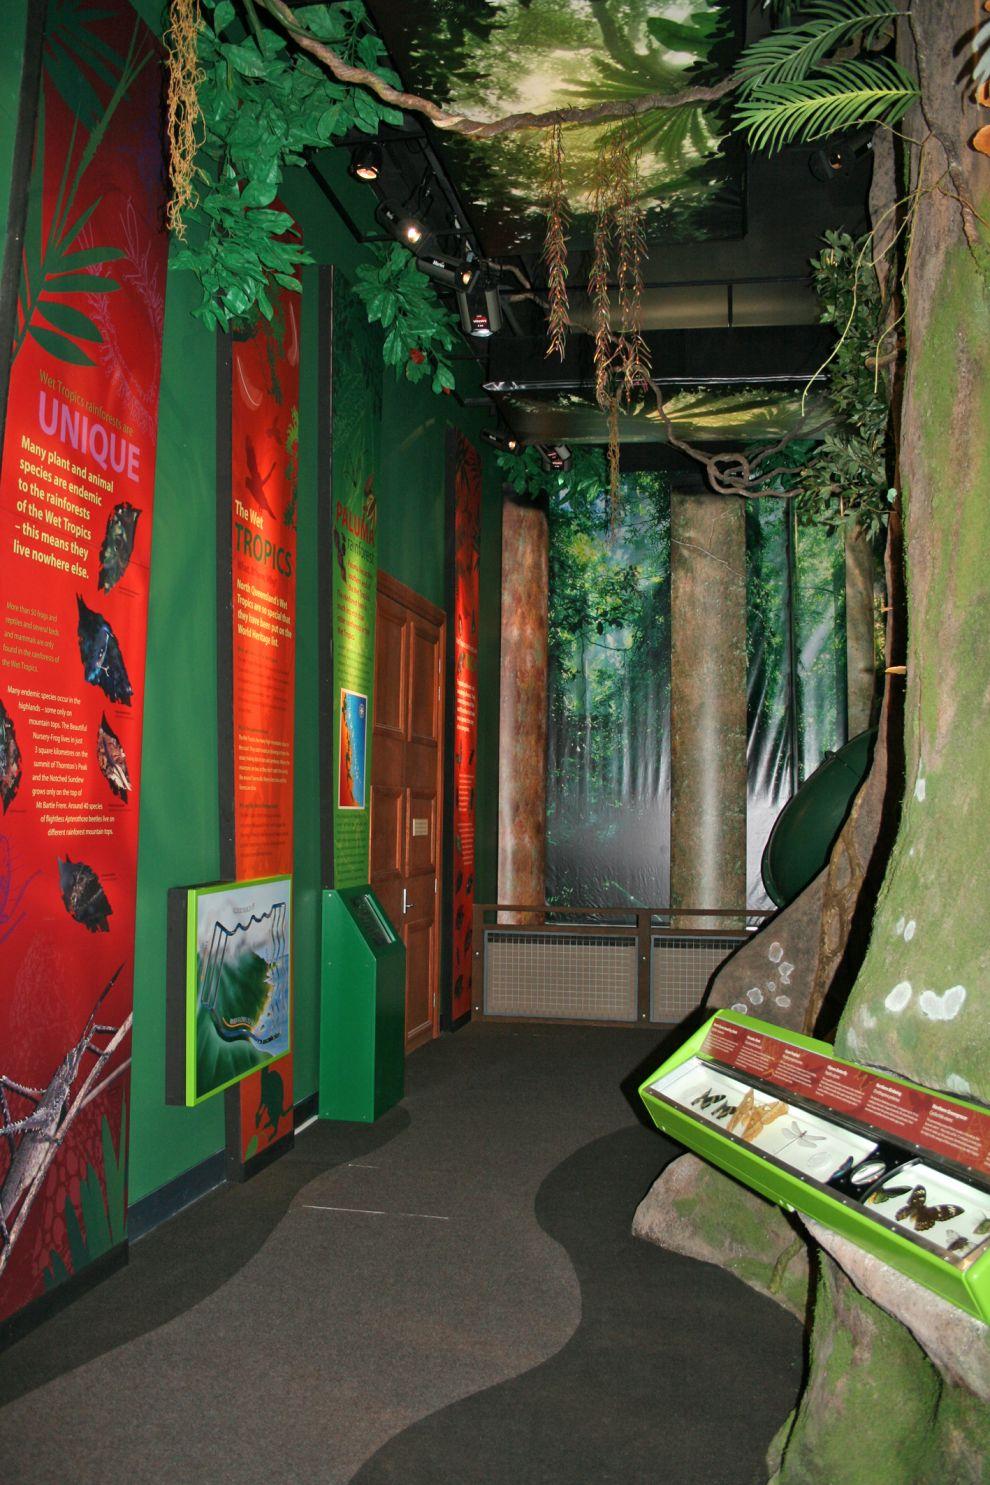 Queensland Tropical Museum Rainforest Exhibit opening, Townsville, December 2007 Photographer: Campbell Clarke